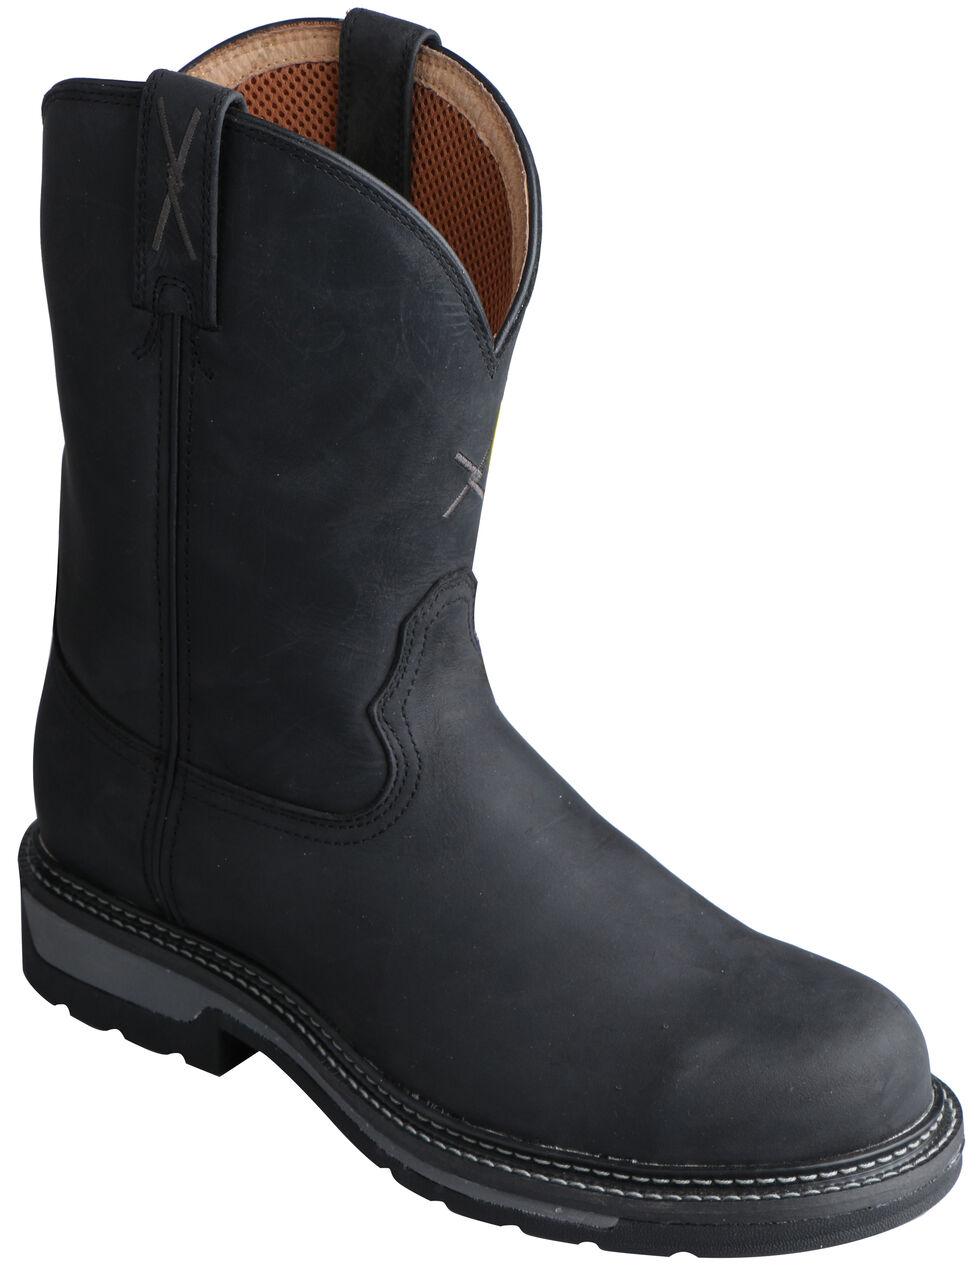 Twisted X Black Lite Cowboy Work Boots - Steel Toe , Distressed, hi-res